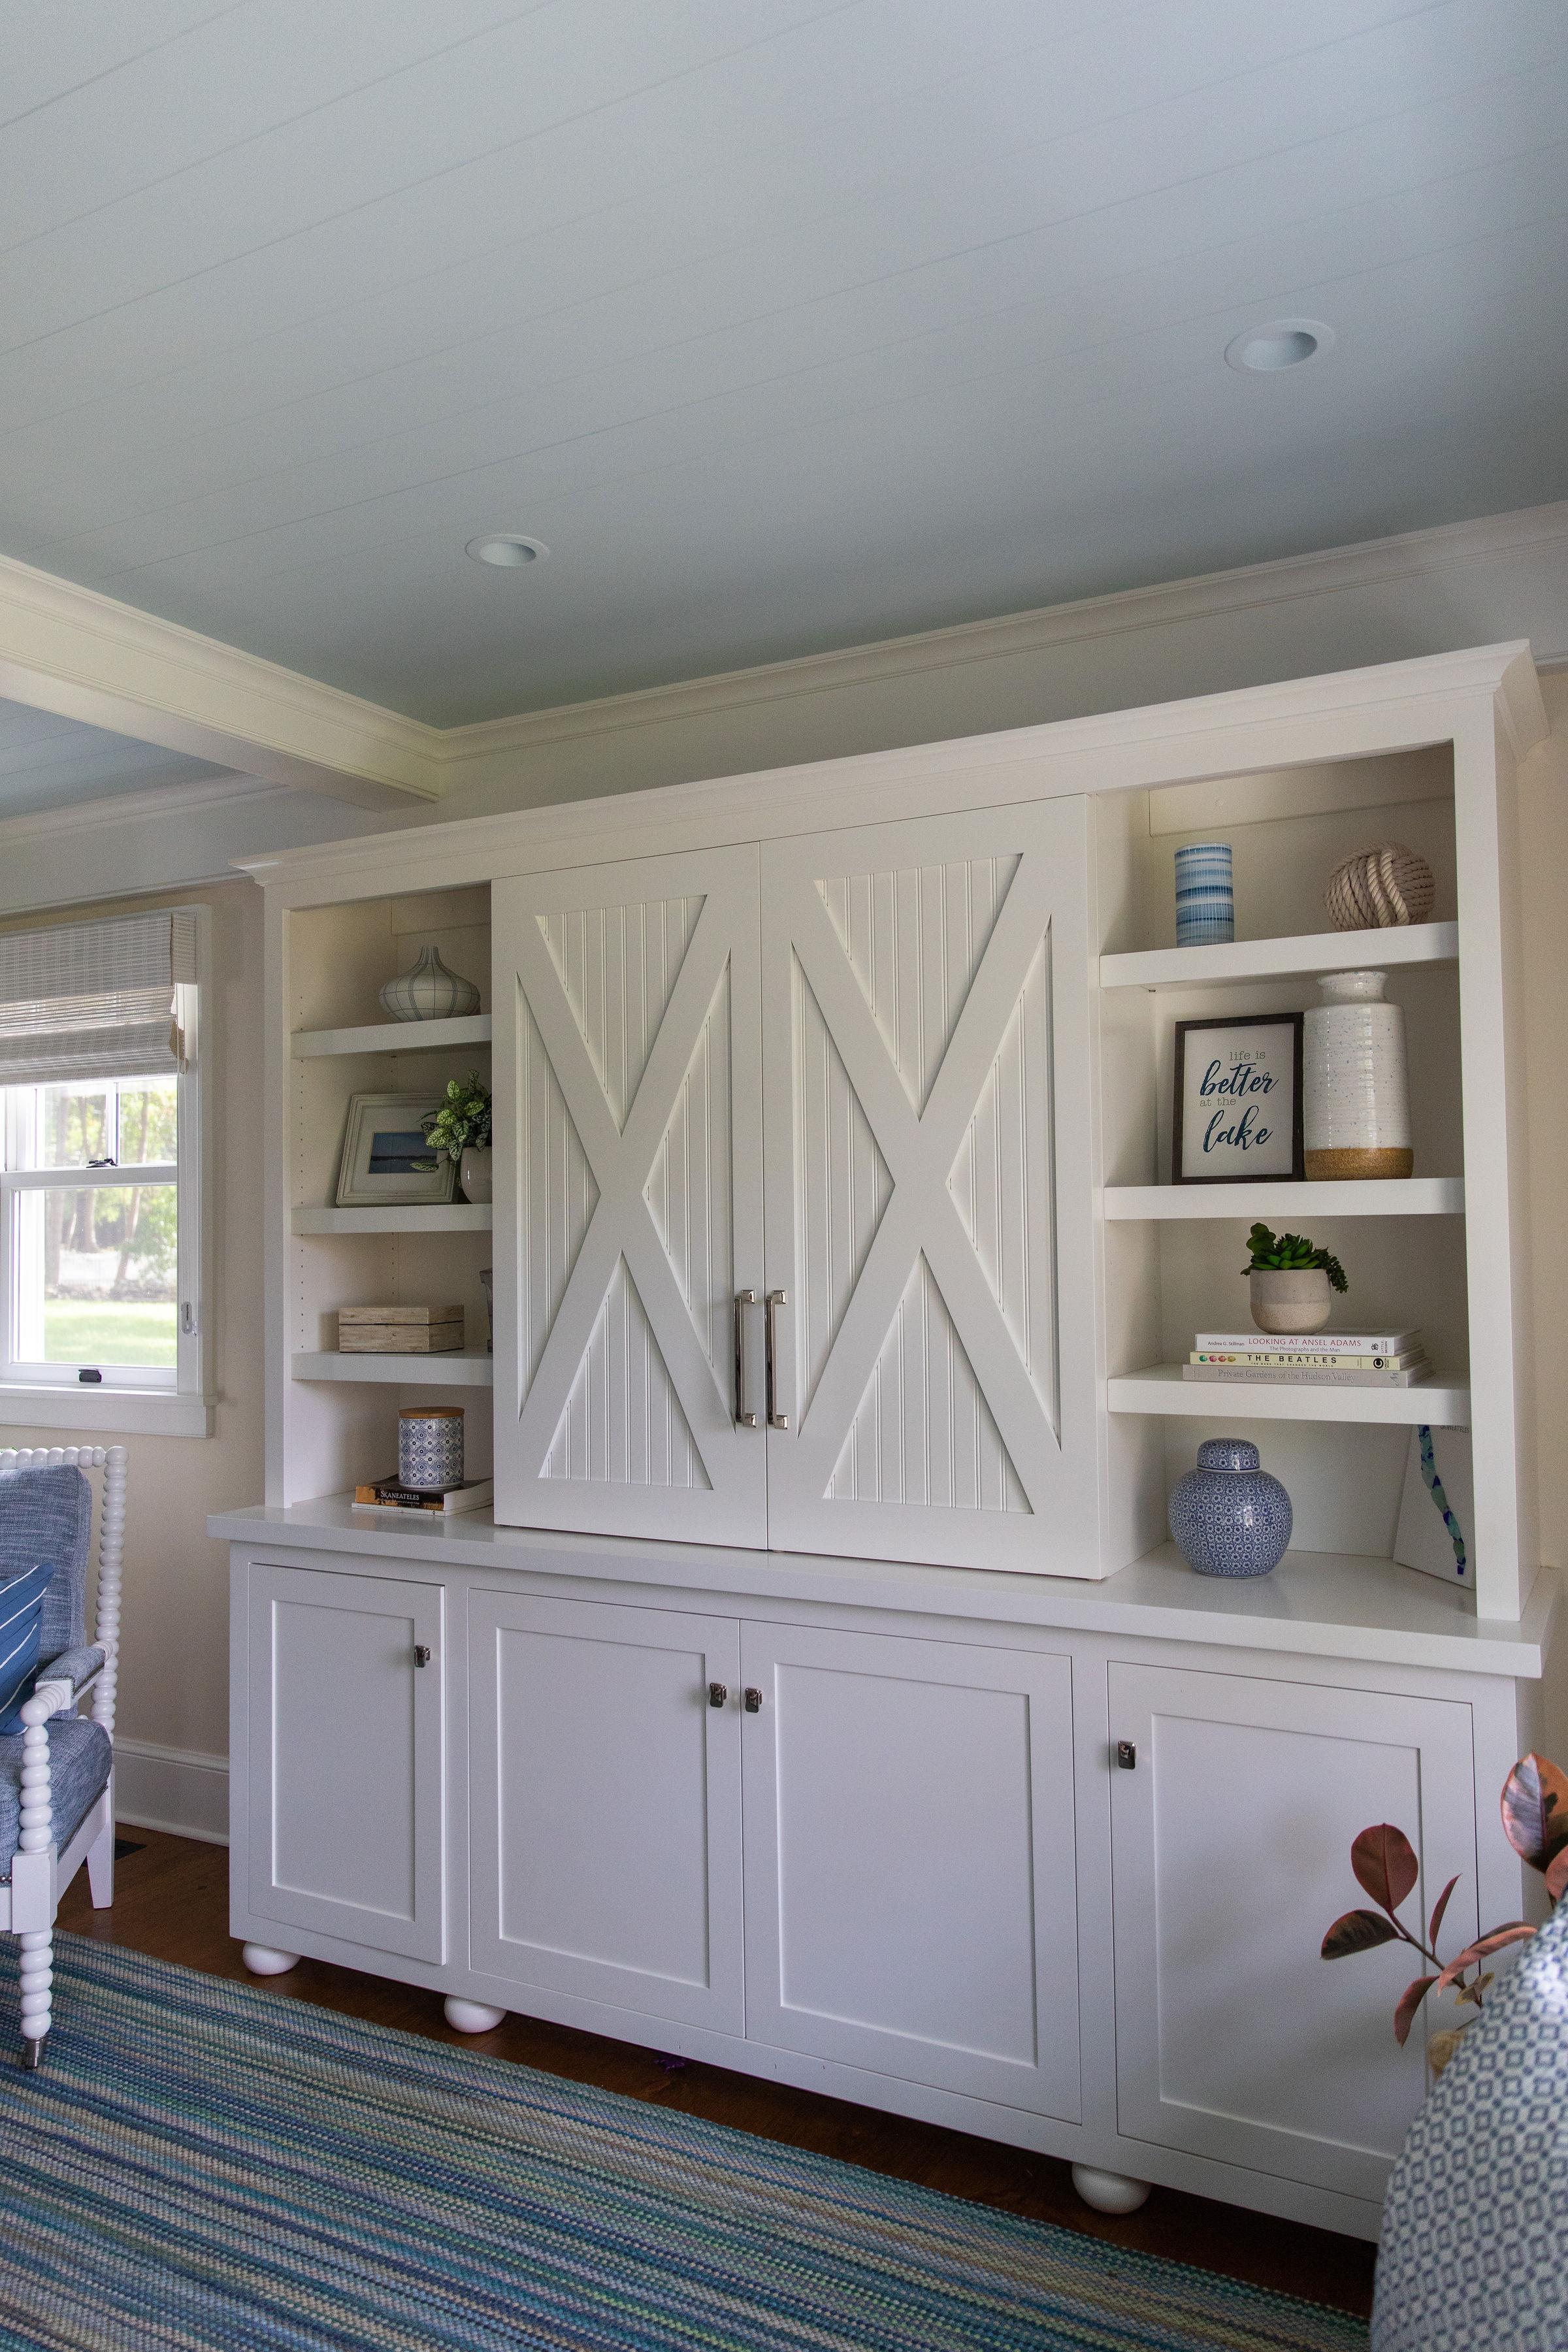 Built in storage ideas by Teaselwood Design, Skaneateles, New York interior designer